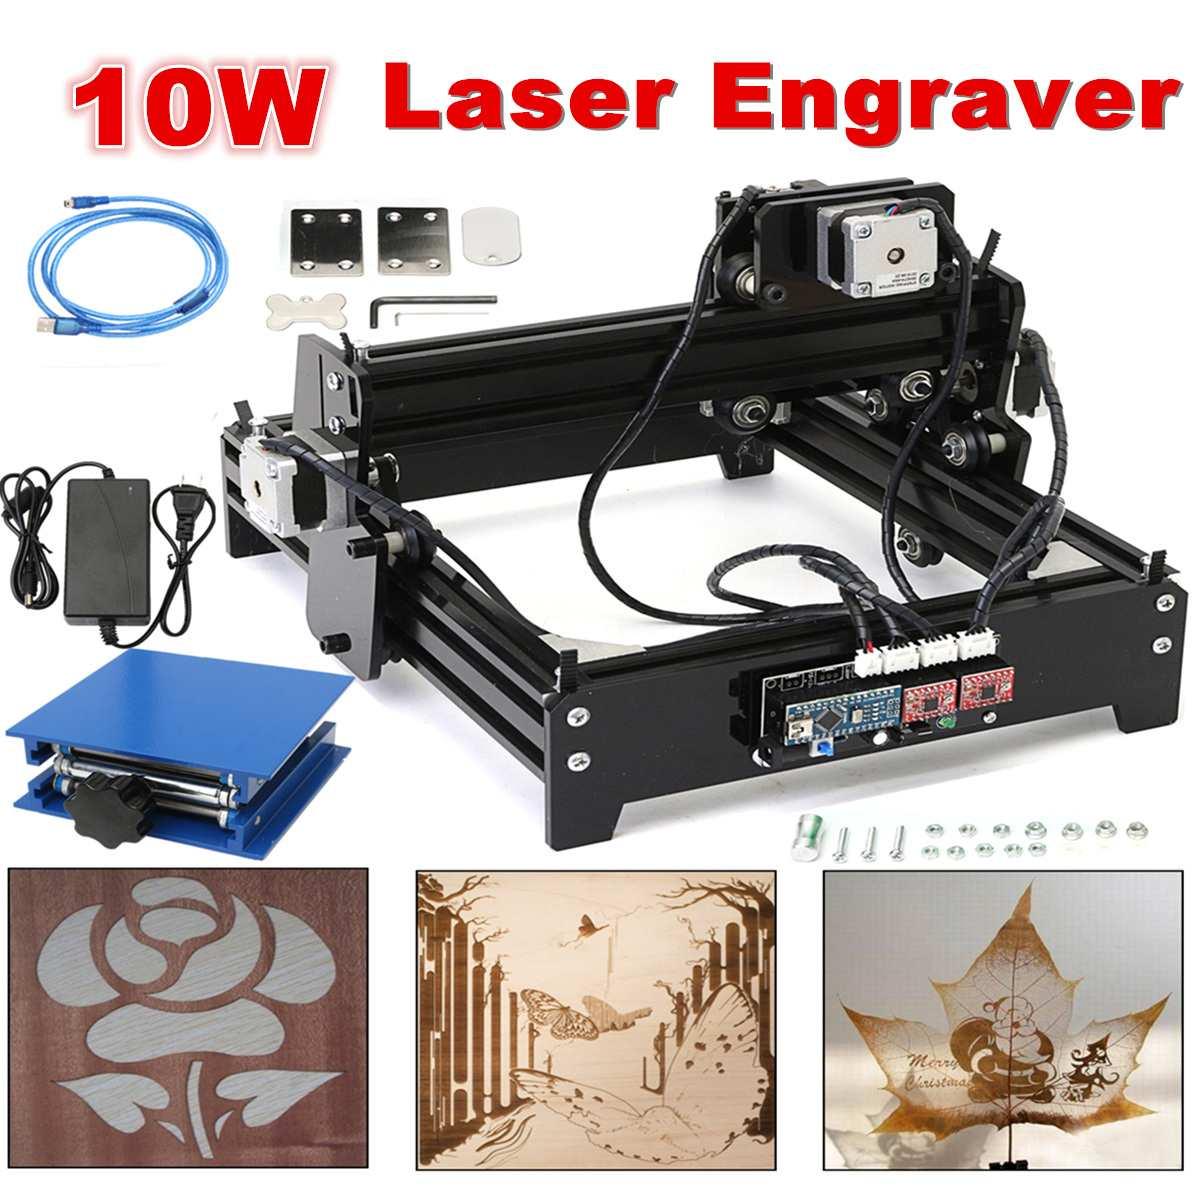 10W USB Desktop DIY Metals Stone Wood CNC Laser Engraver Marking Engraving Machine Engraving Wood Router Area 20 X 14 Cm